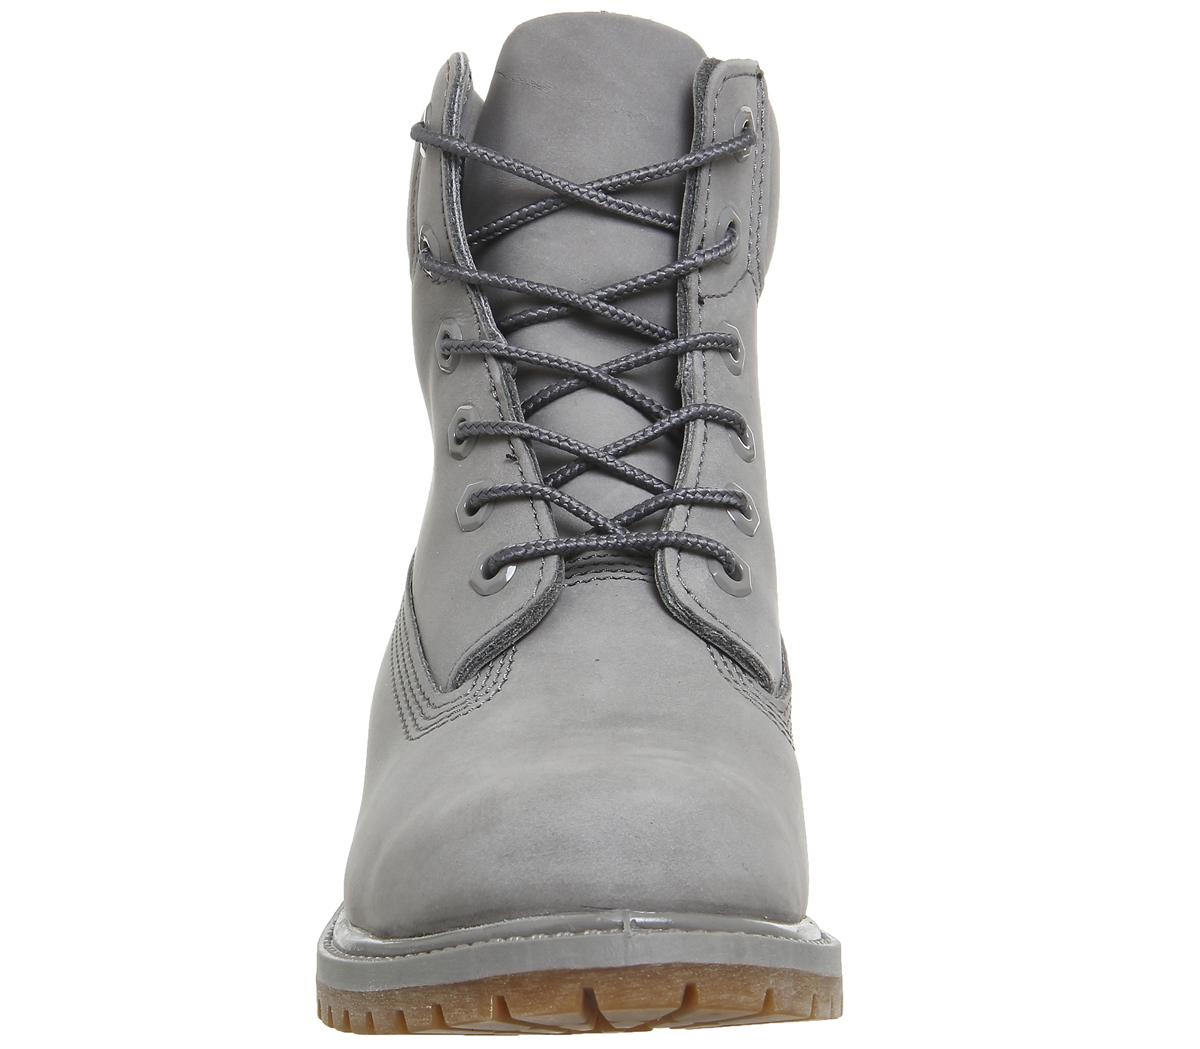 damen timberland premium 6 boots grau steeple grau mono stiefel ebay. Black Bedroom Furniture Sets. Home Design Ideas